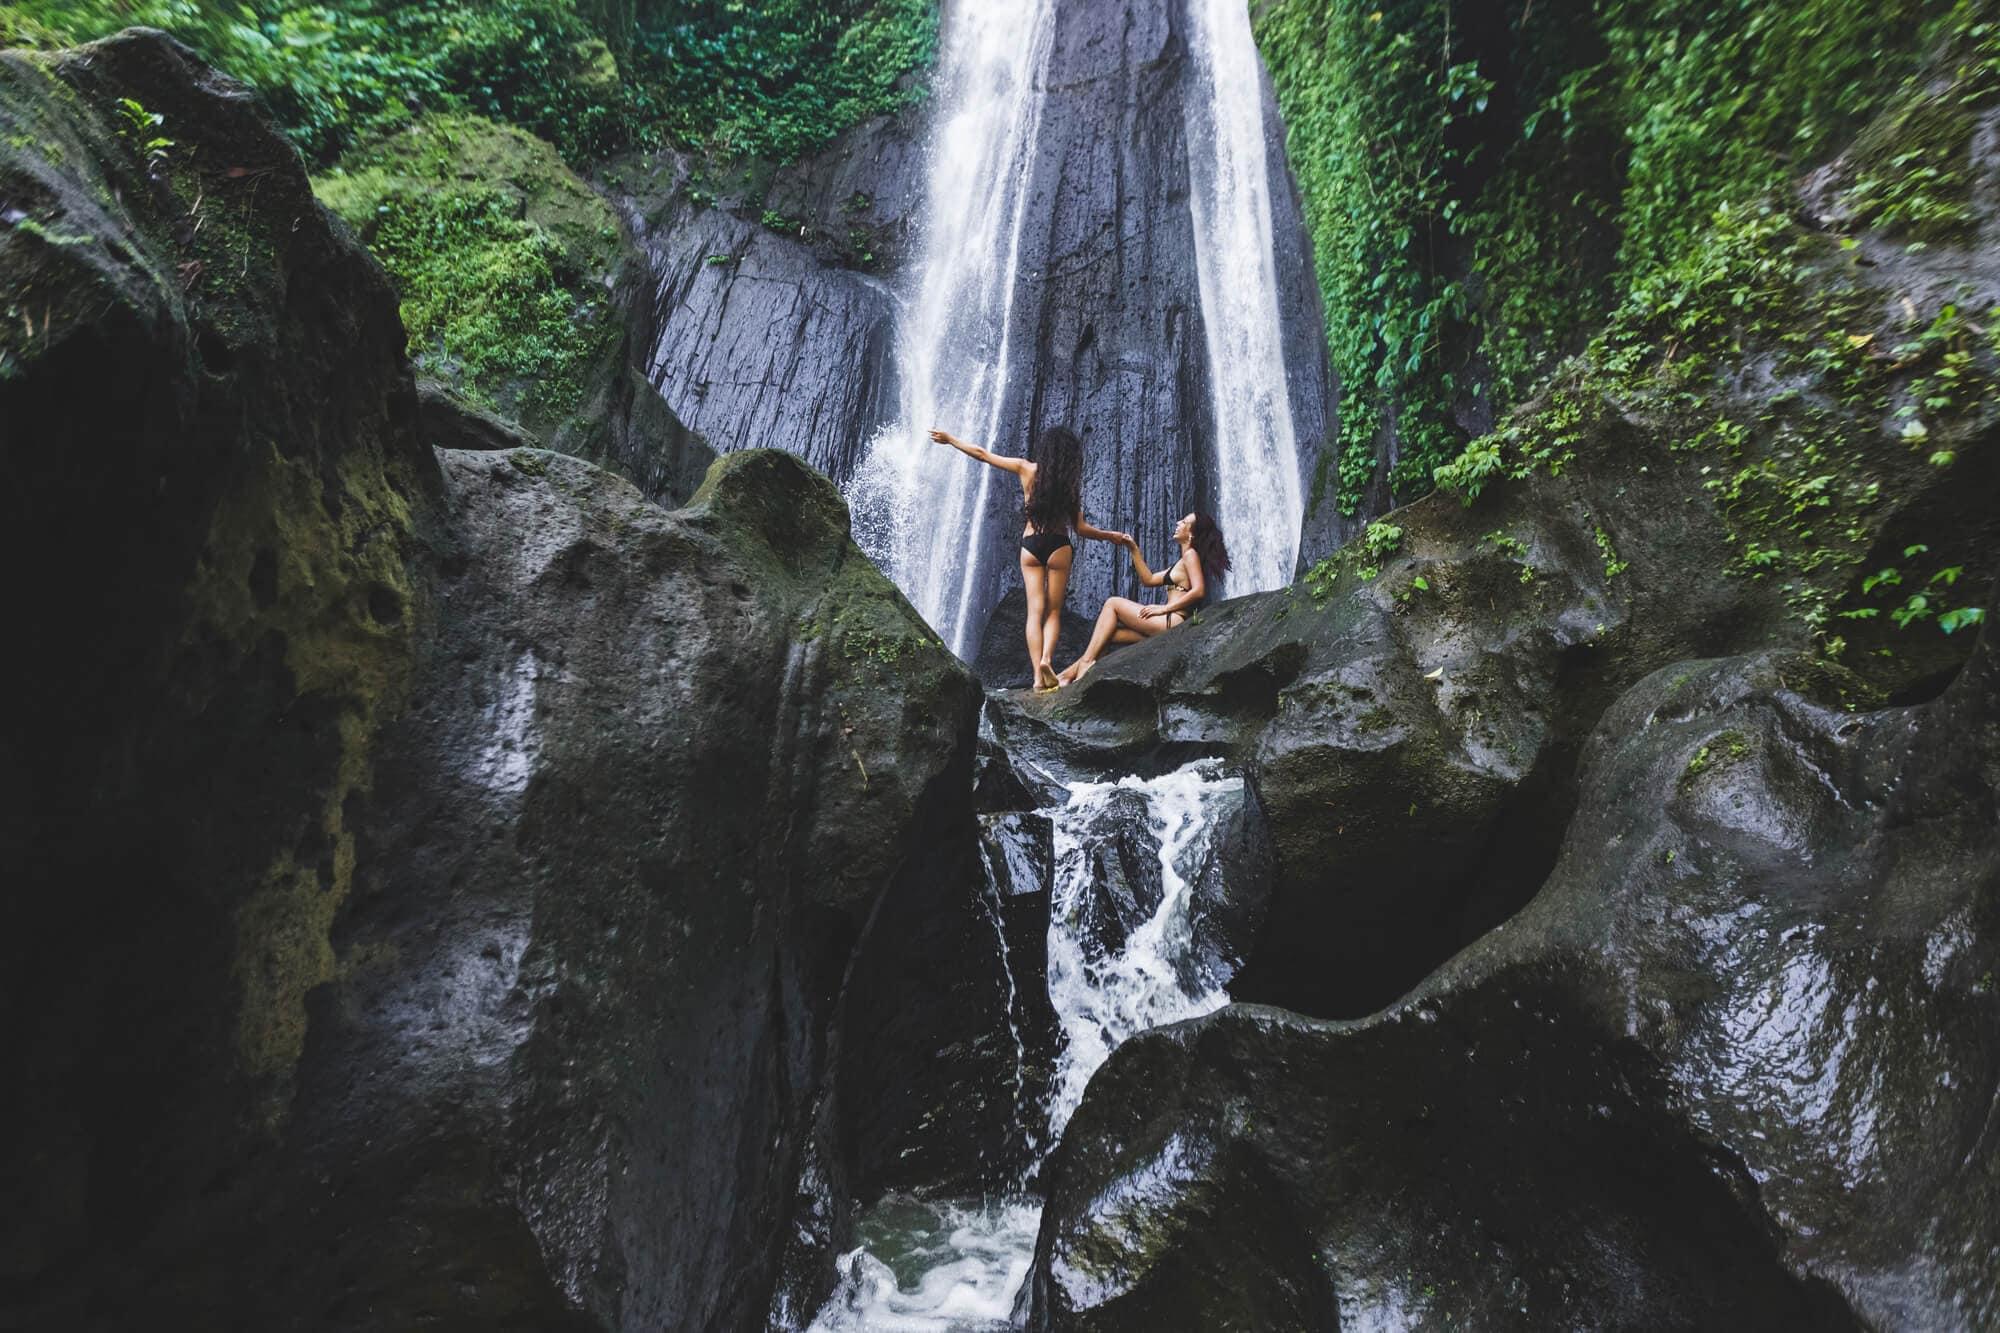 Dusun Kuning Waterfall - One of the best waterfalls in East Bali